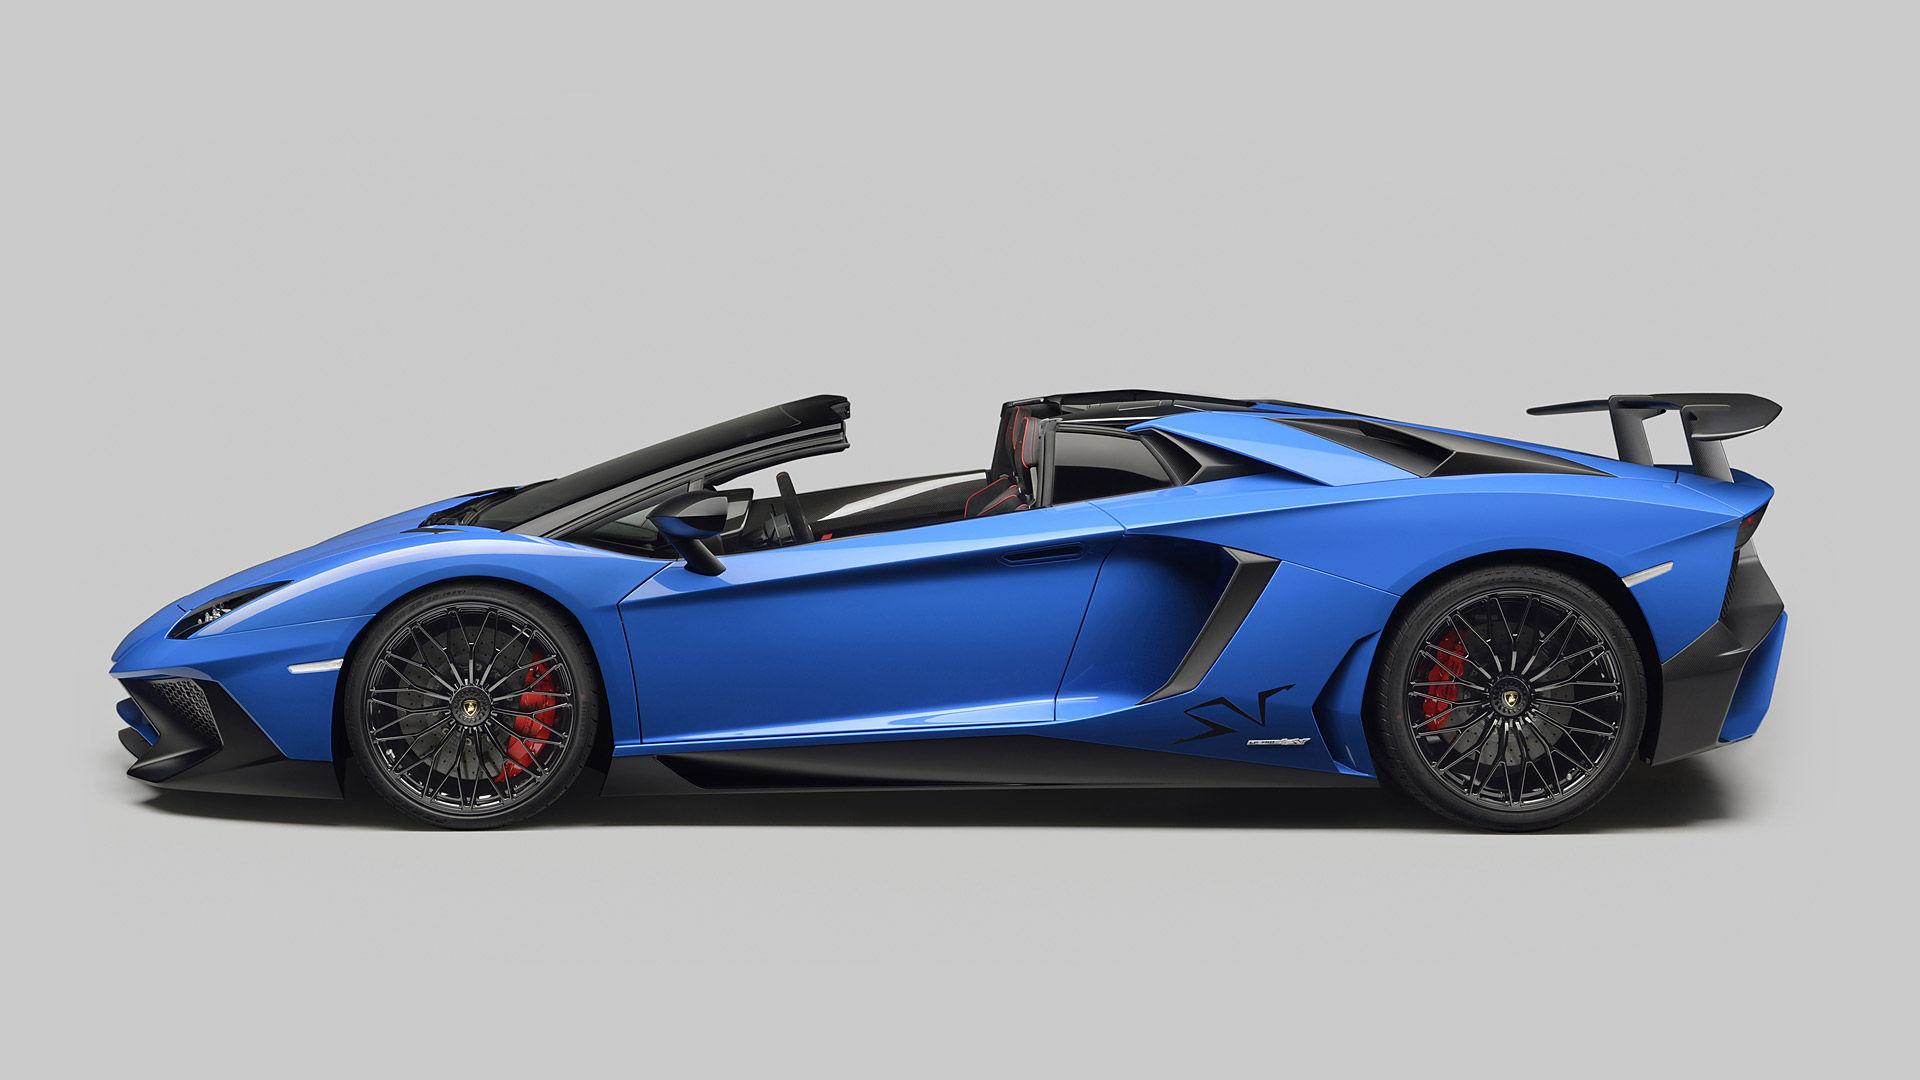 2016 Lamborghini Aventador LP750-4 SV Roadster